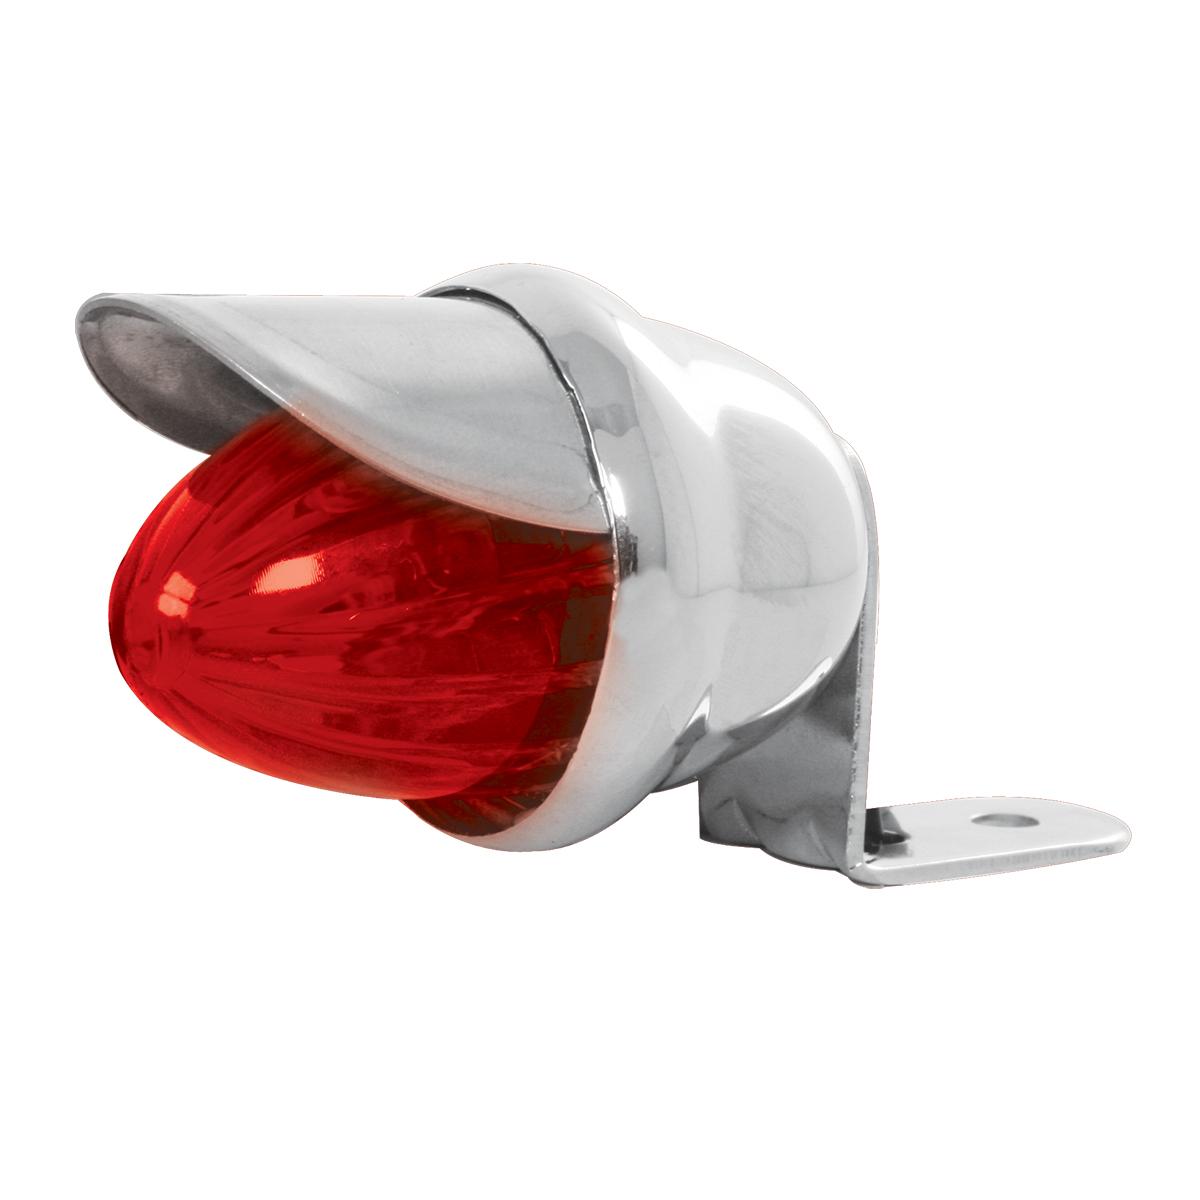 #82775 Mini Red Marker & Clearance Single Light